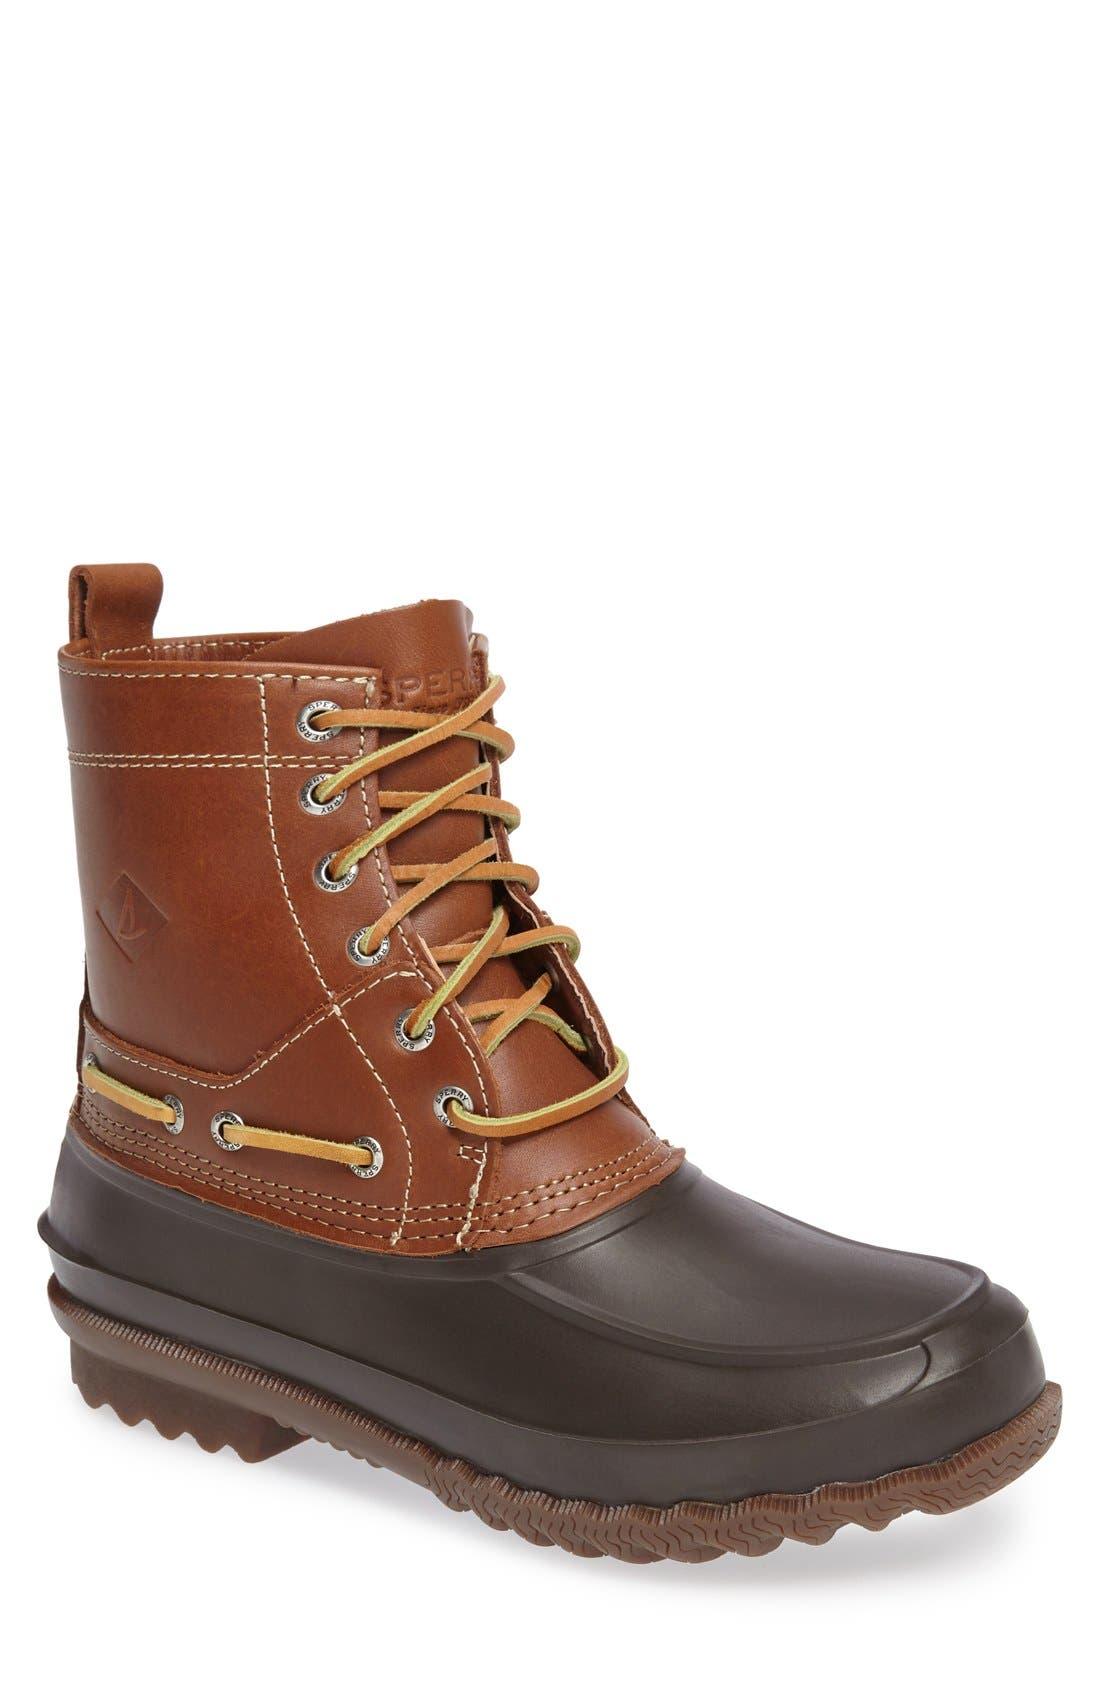 Alternate Image 1 Selected - Sperry 'Decoy' Waterproof Boot (Men)